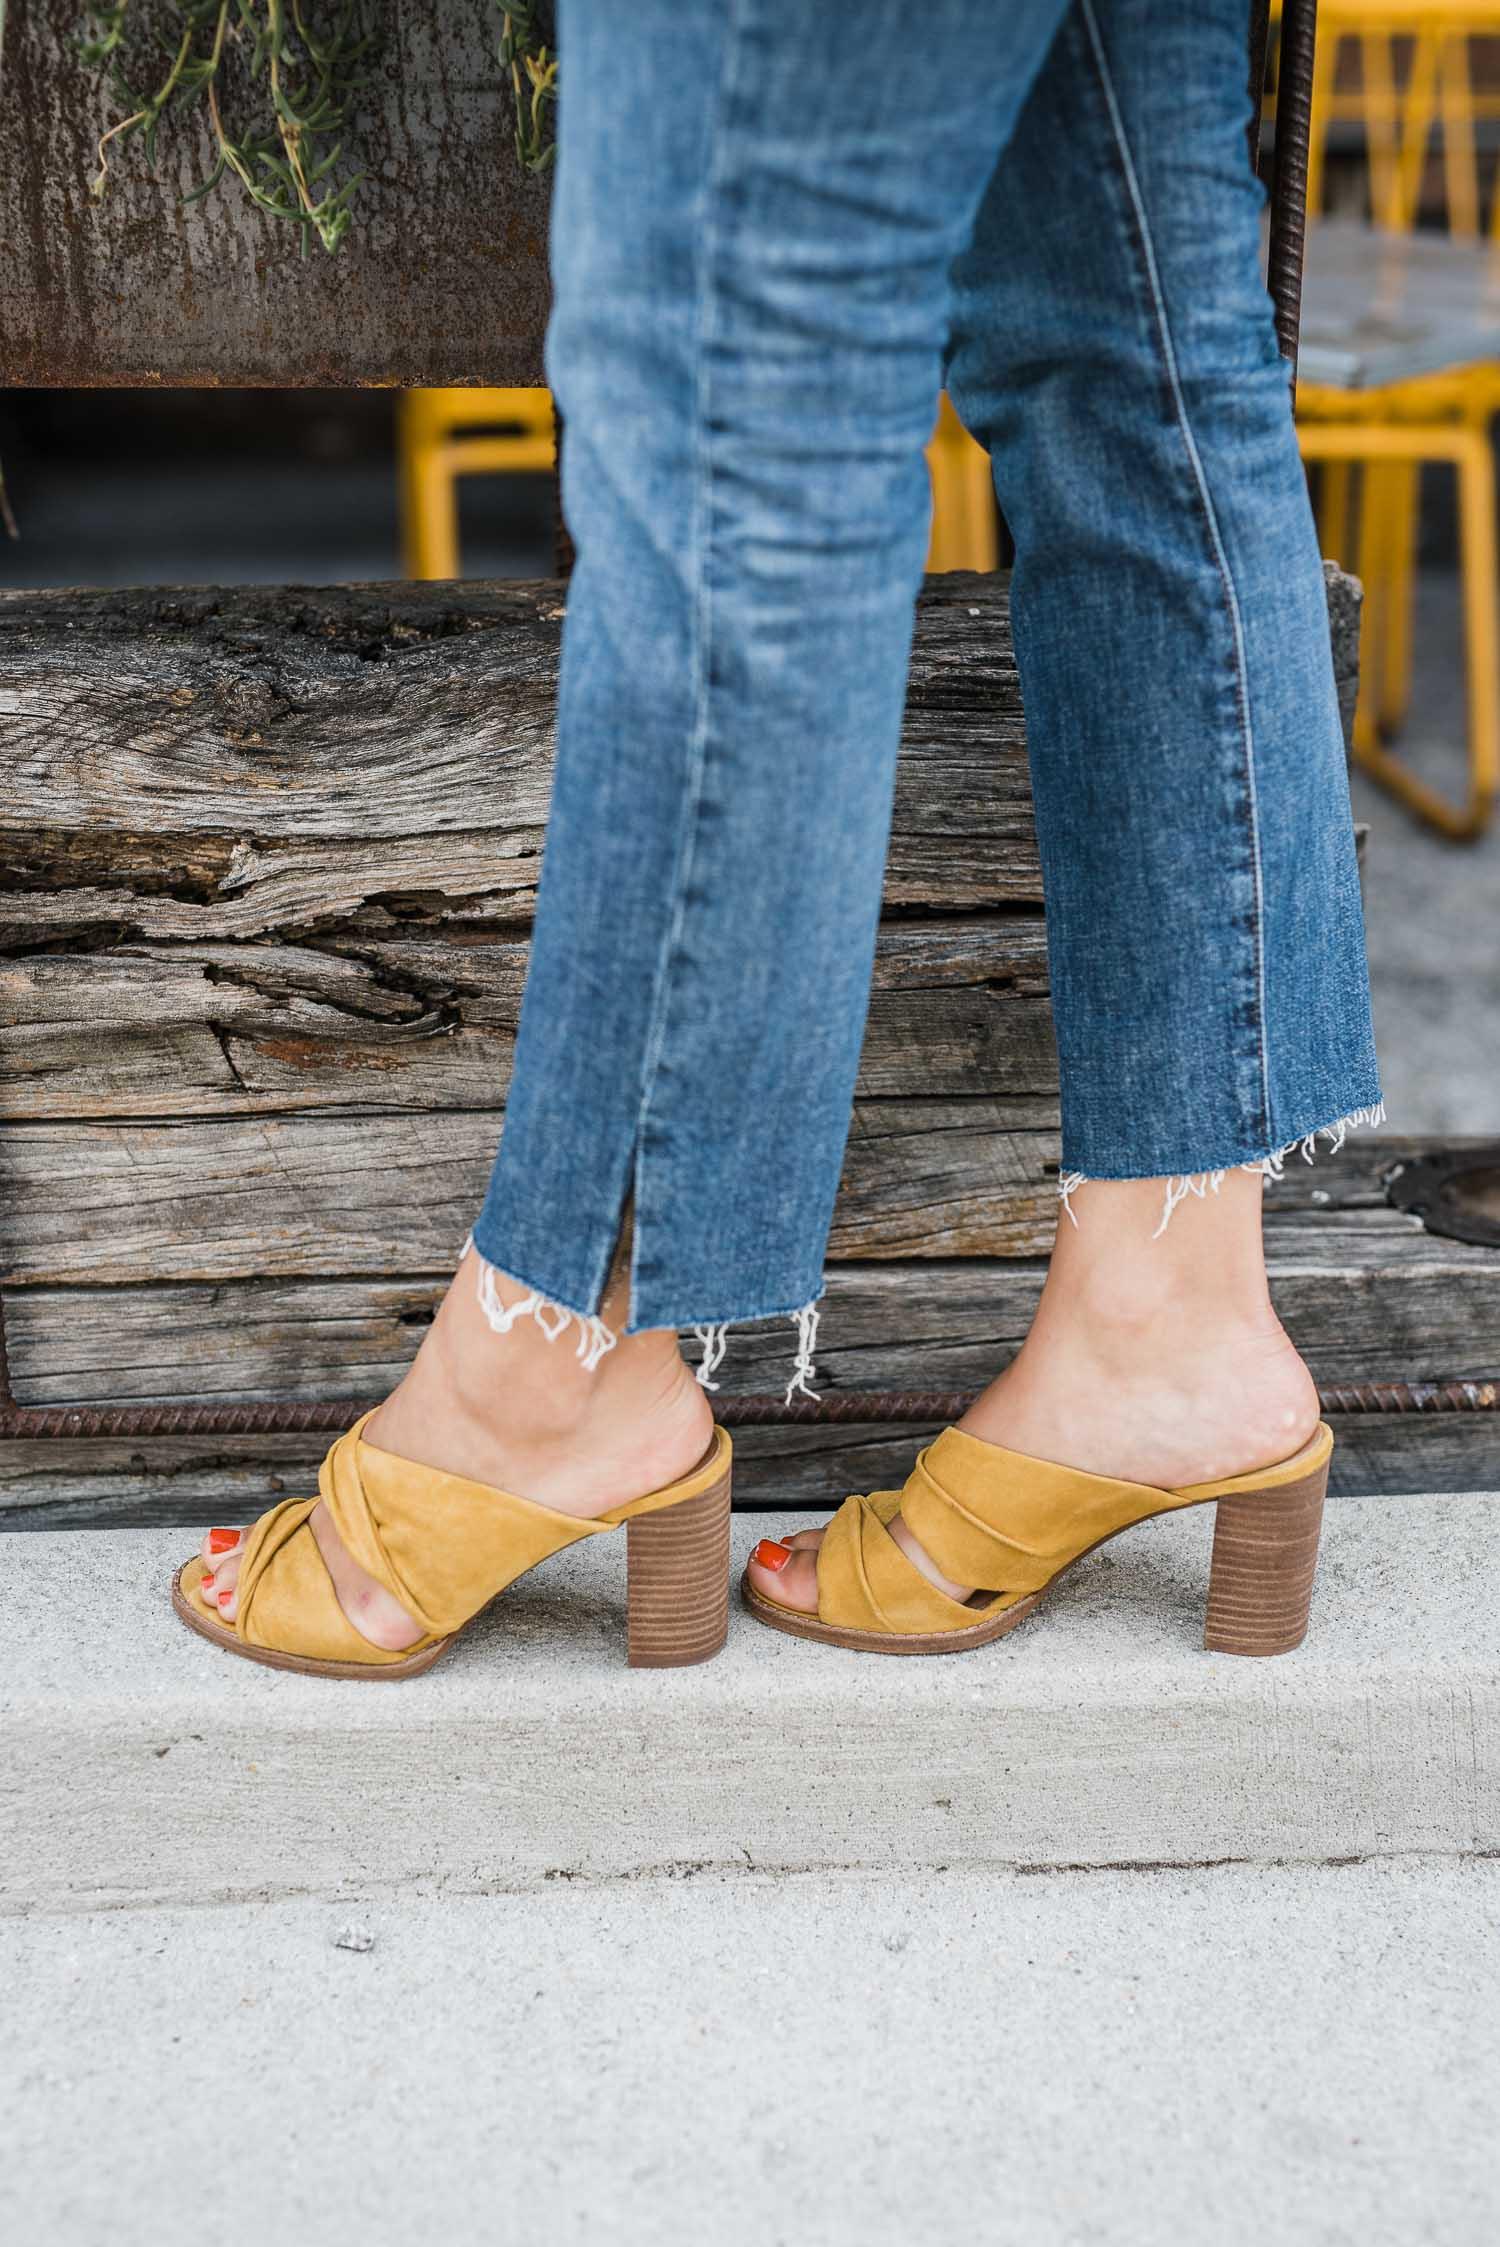 Transition colors help make the seasonal wardrobes blend together